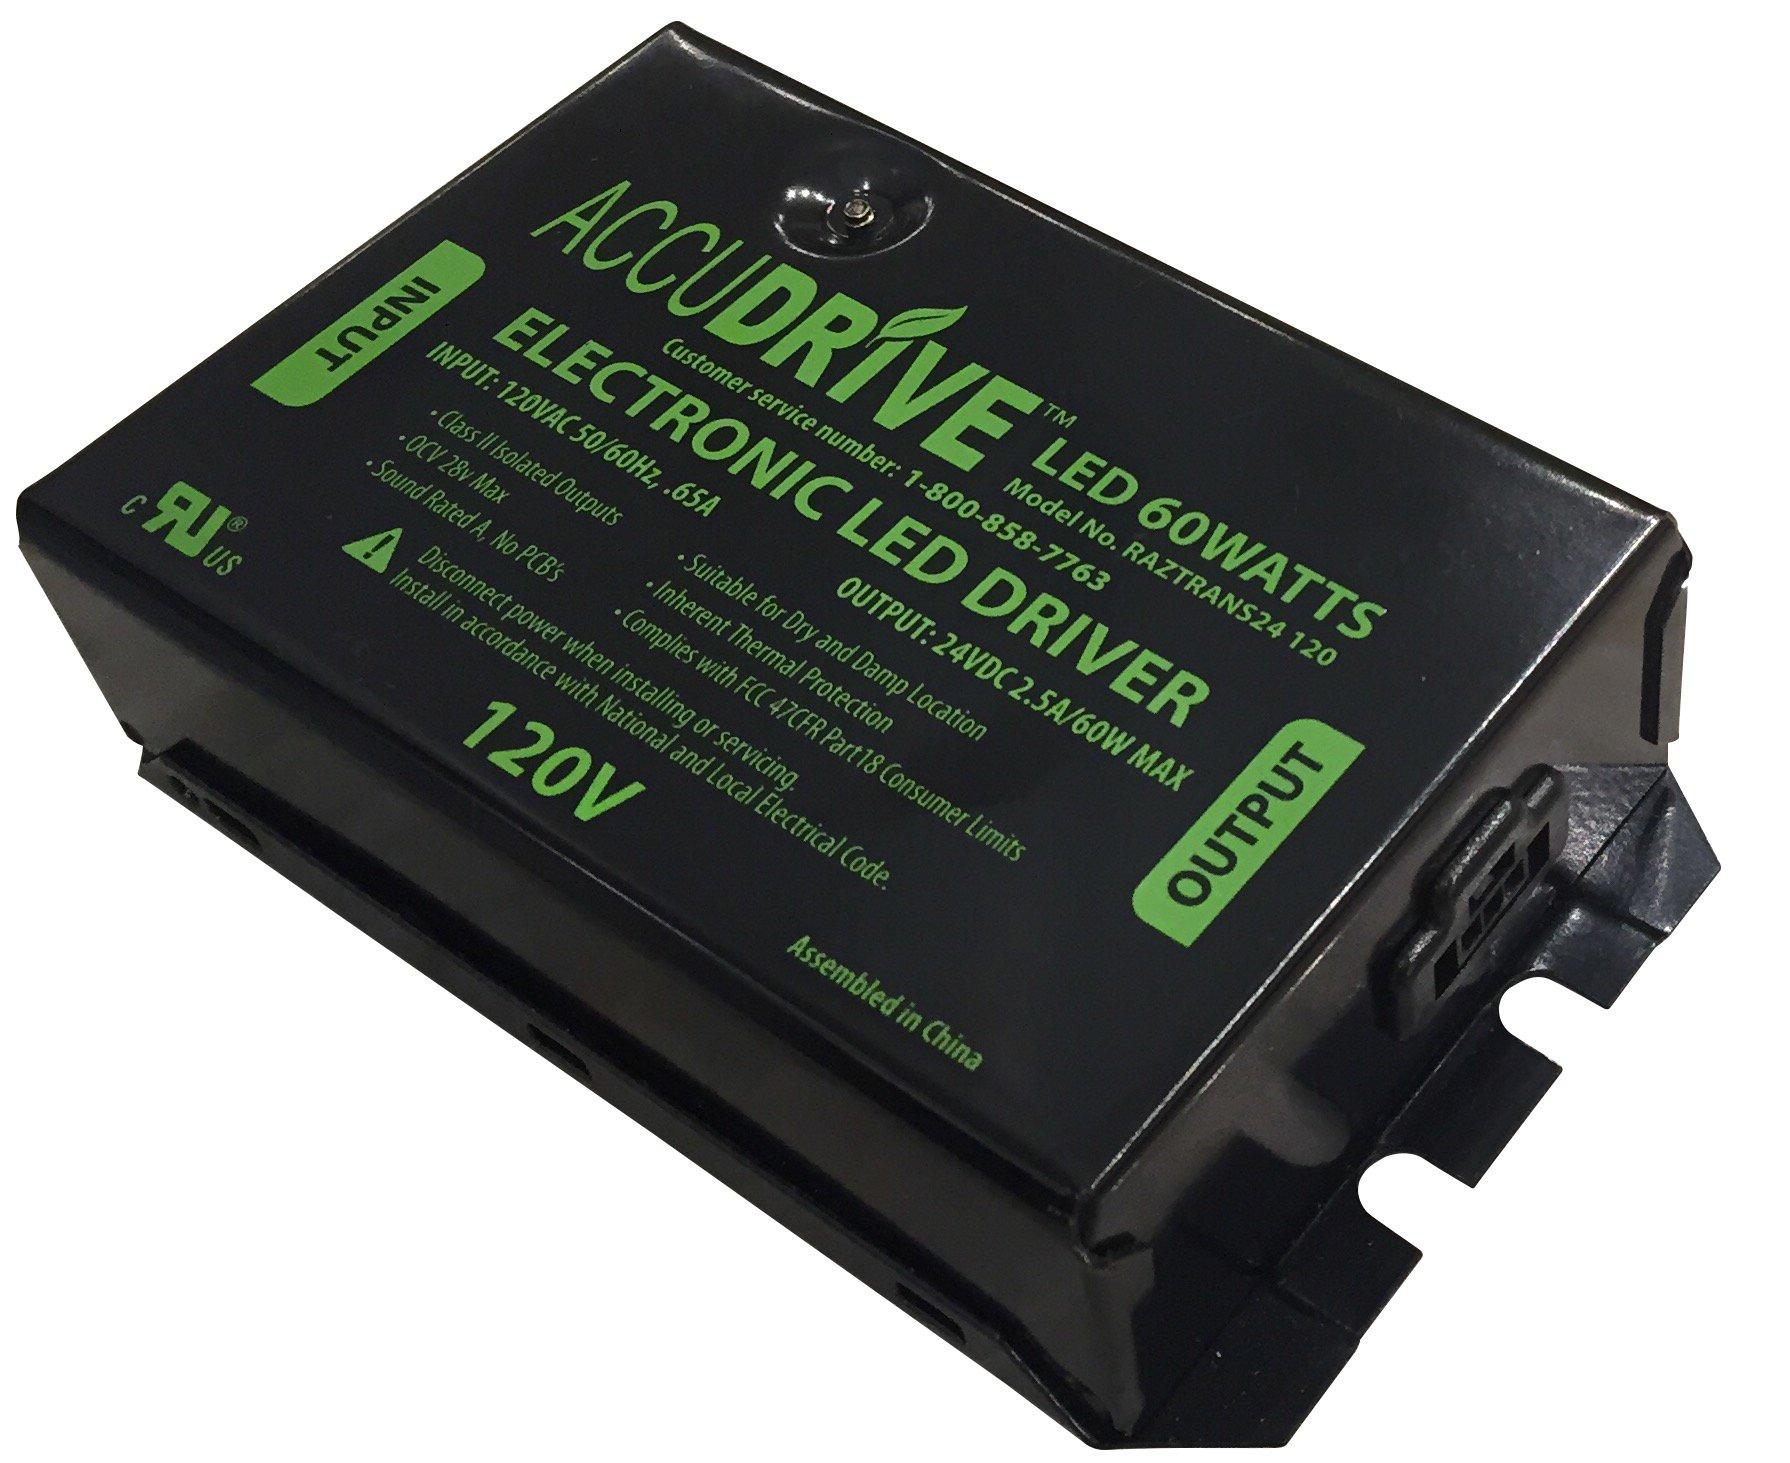 Lithonia Lighting RAZTRANS24 120 M6 Transformer for Rayzer LED Undercabinet, Black by Lithonia Lighting